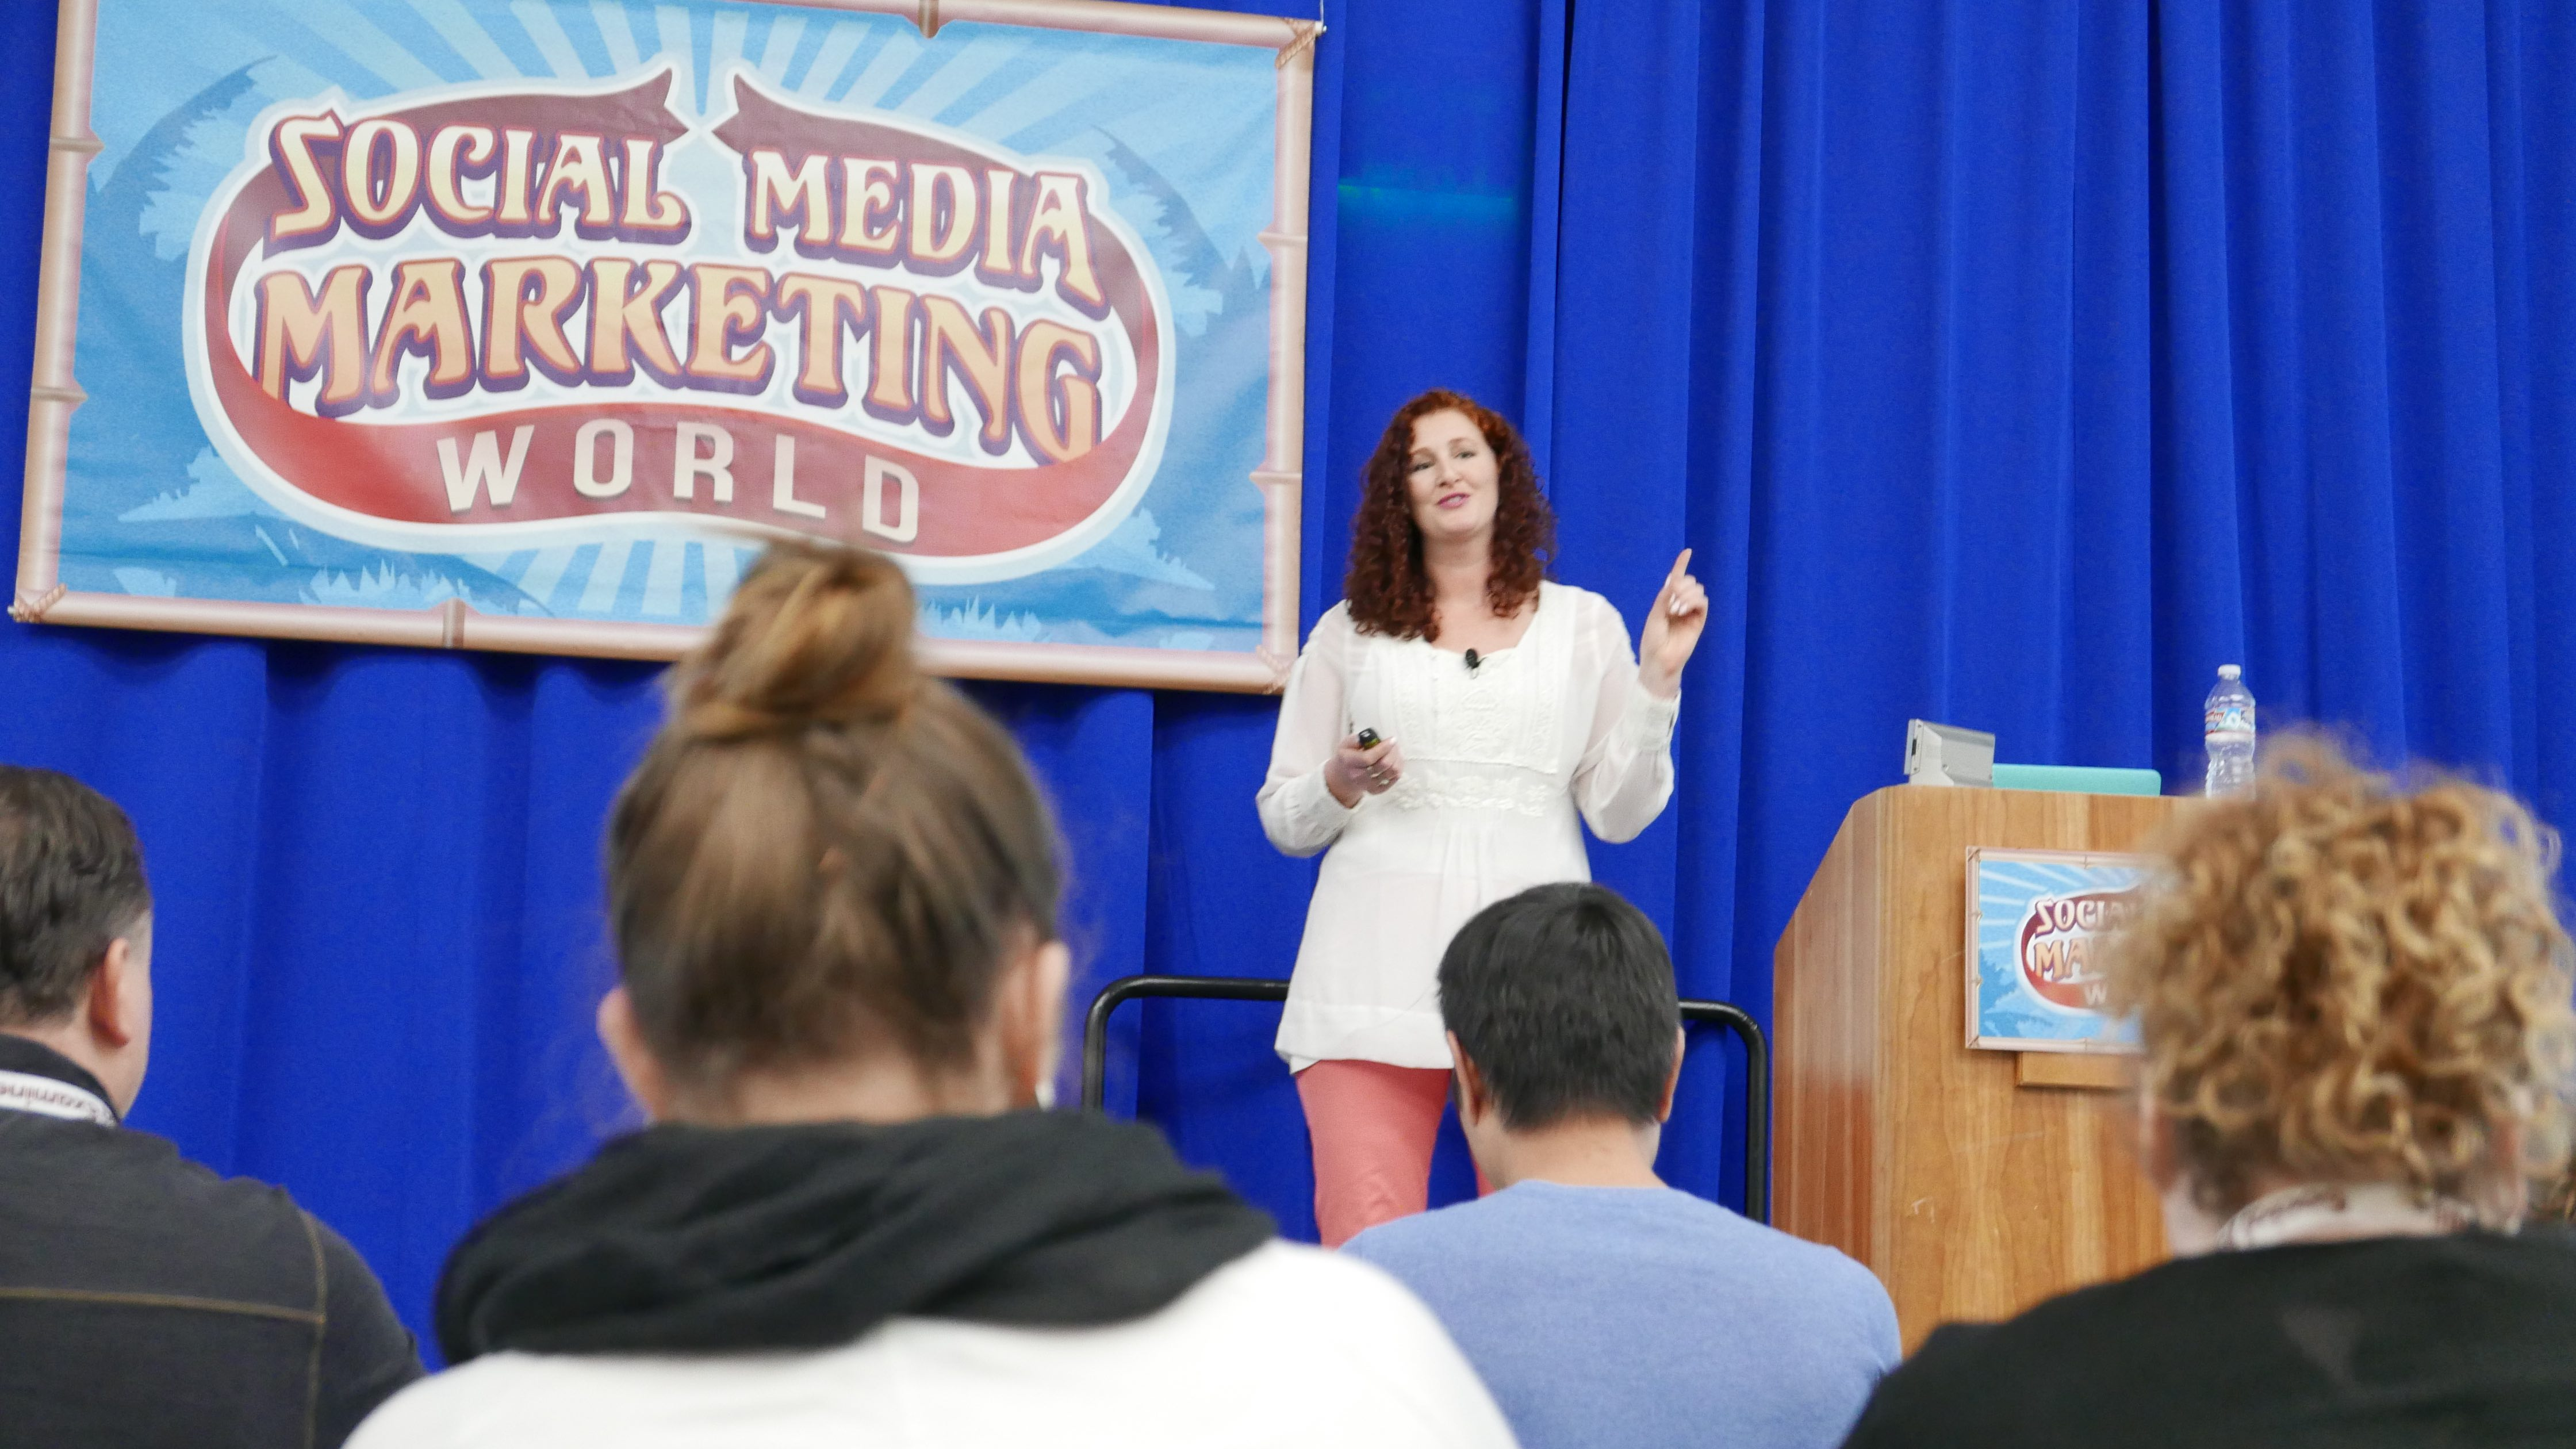 Alisa Meredith Social Media Marketing World